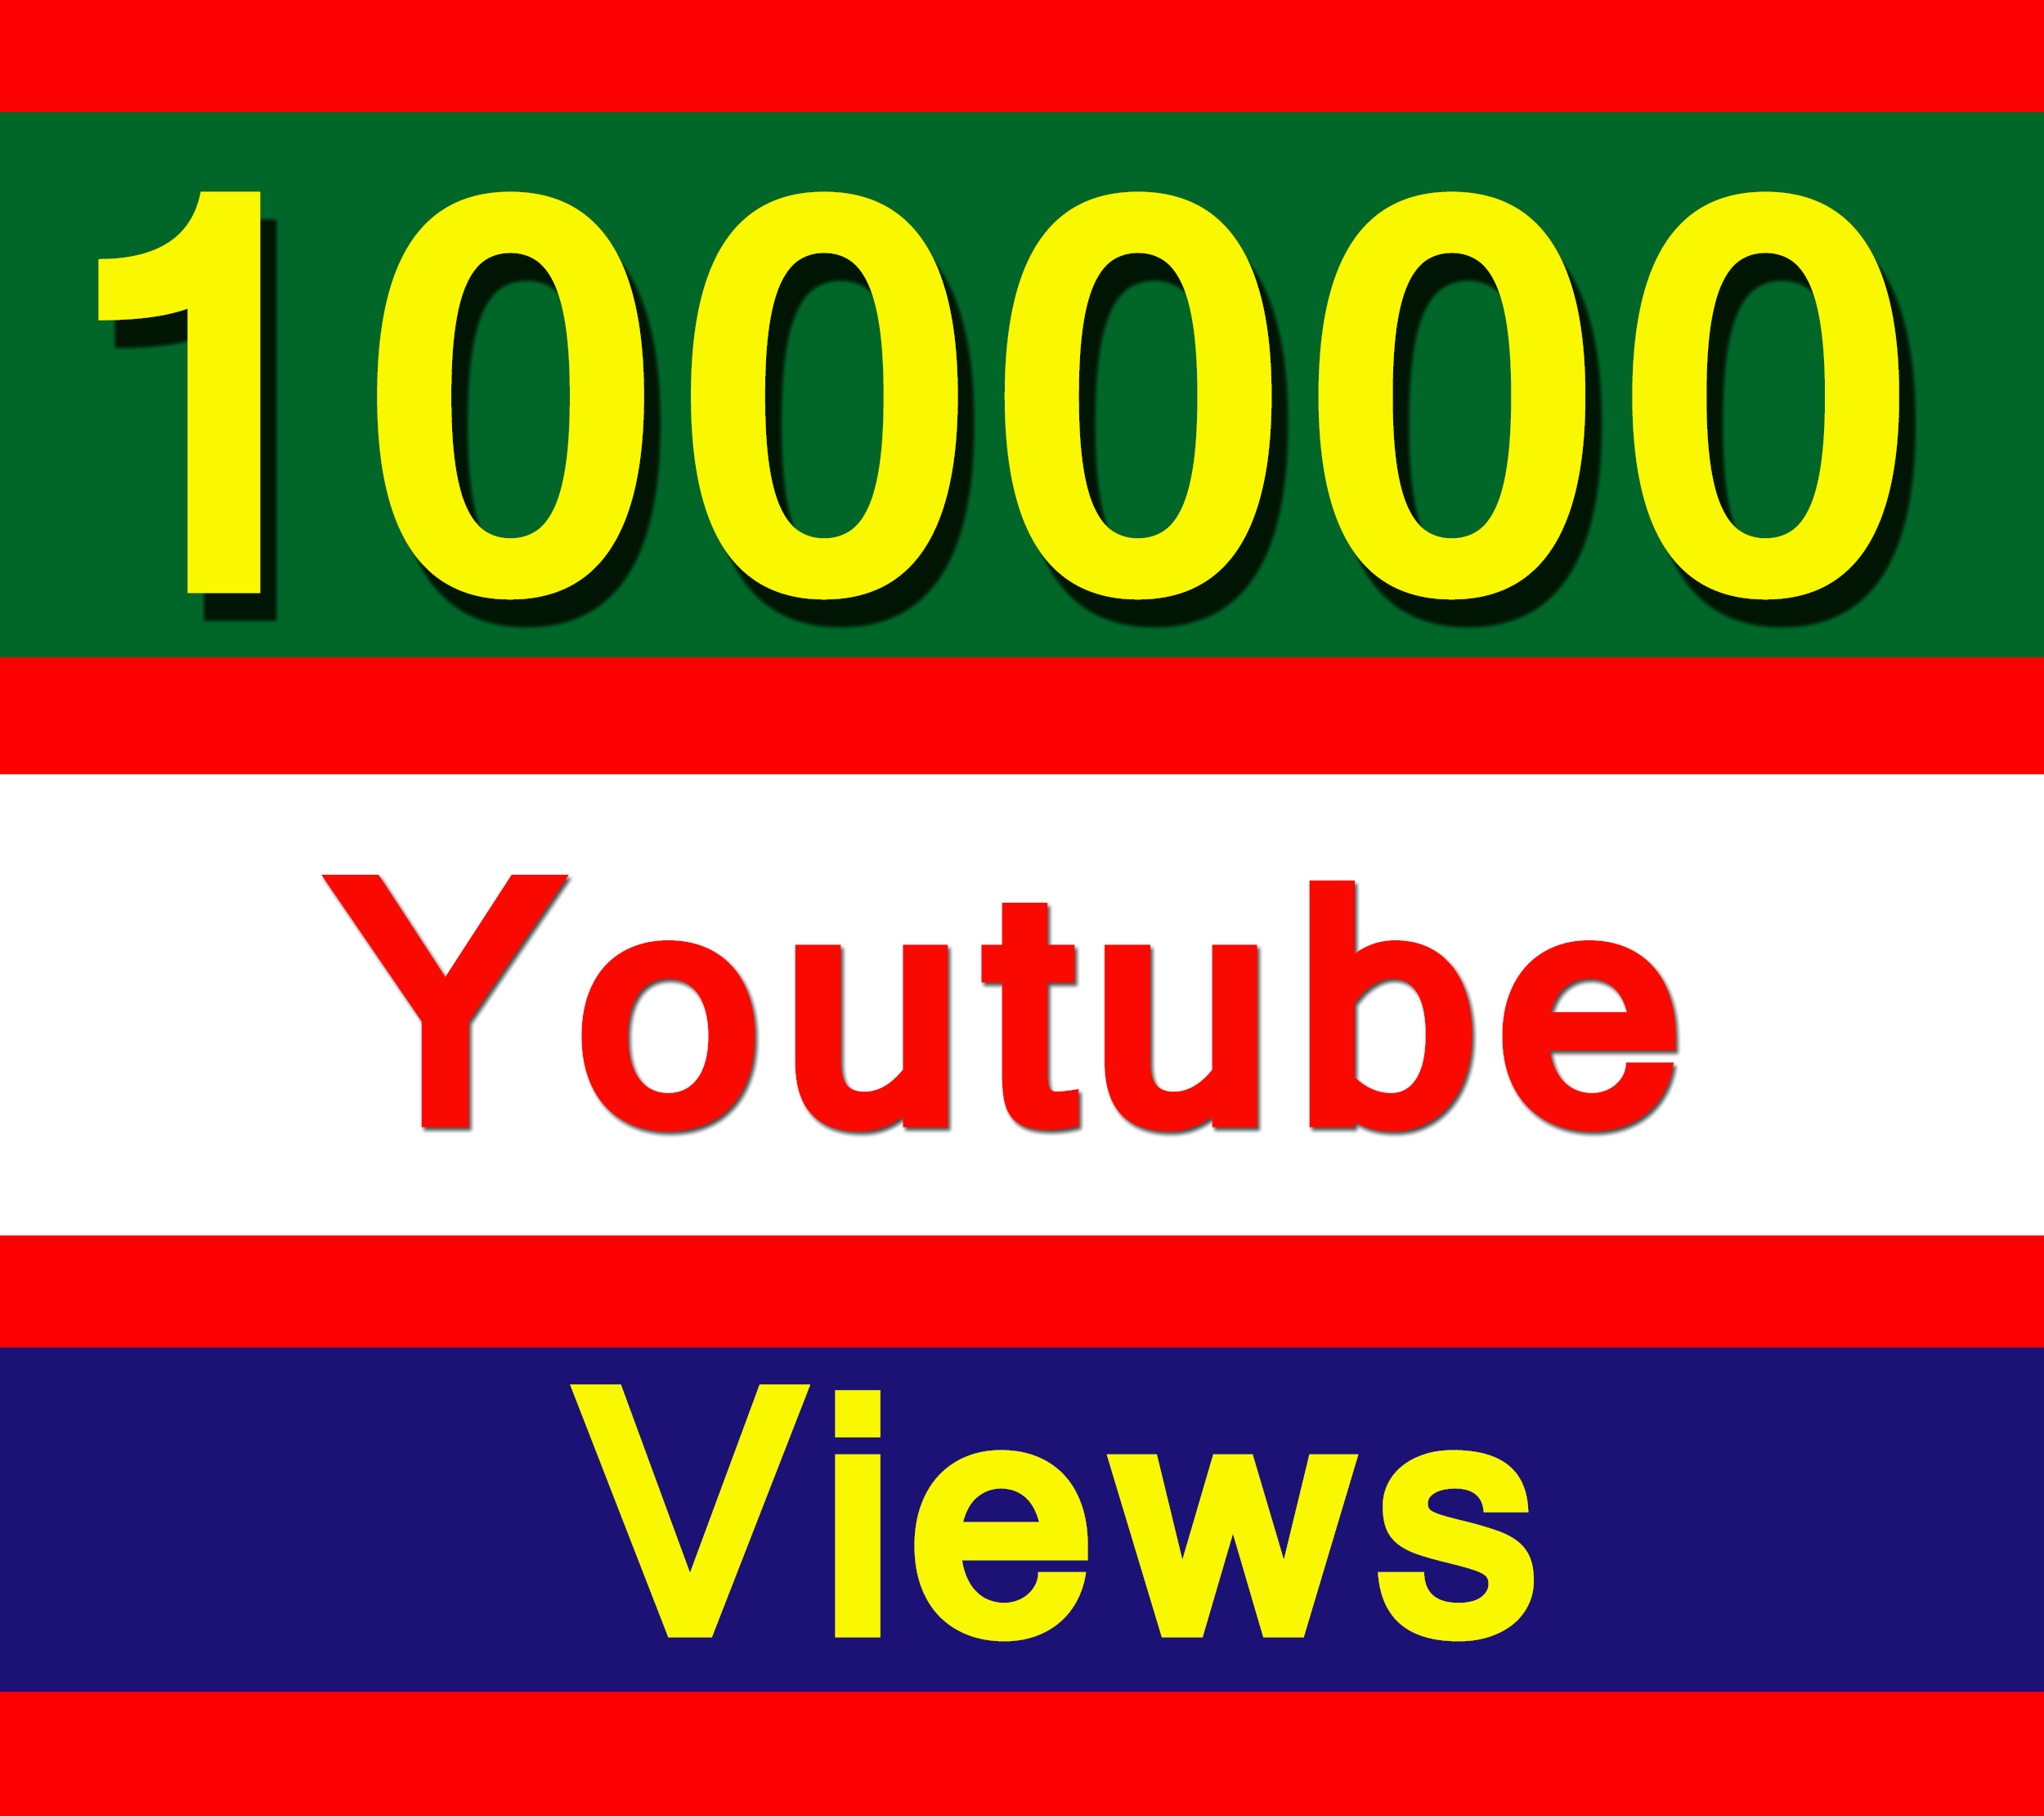 SUPER Fast 100000 YouTube vie ws with 100 Lik es